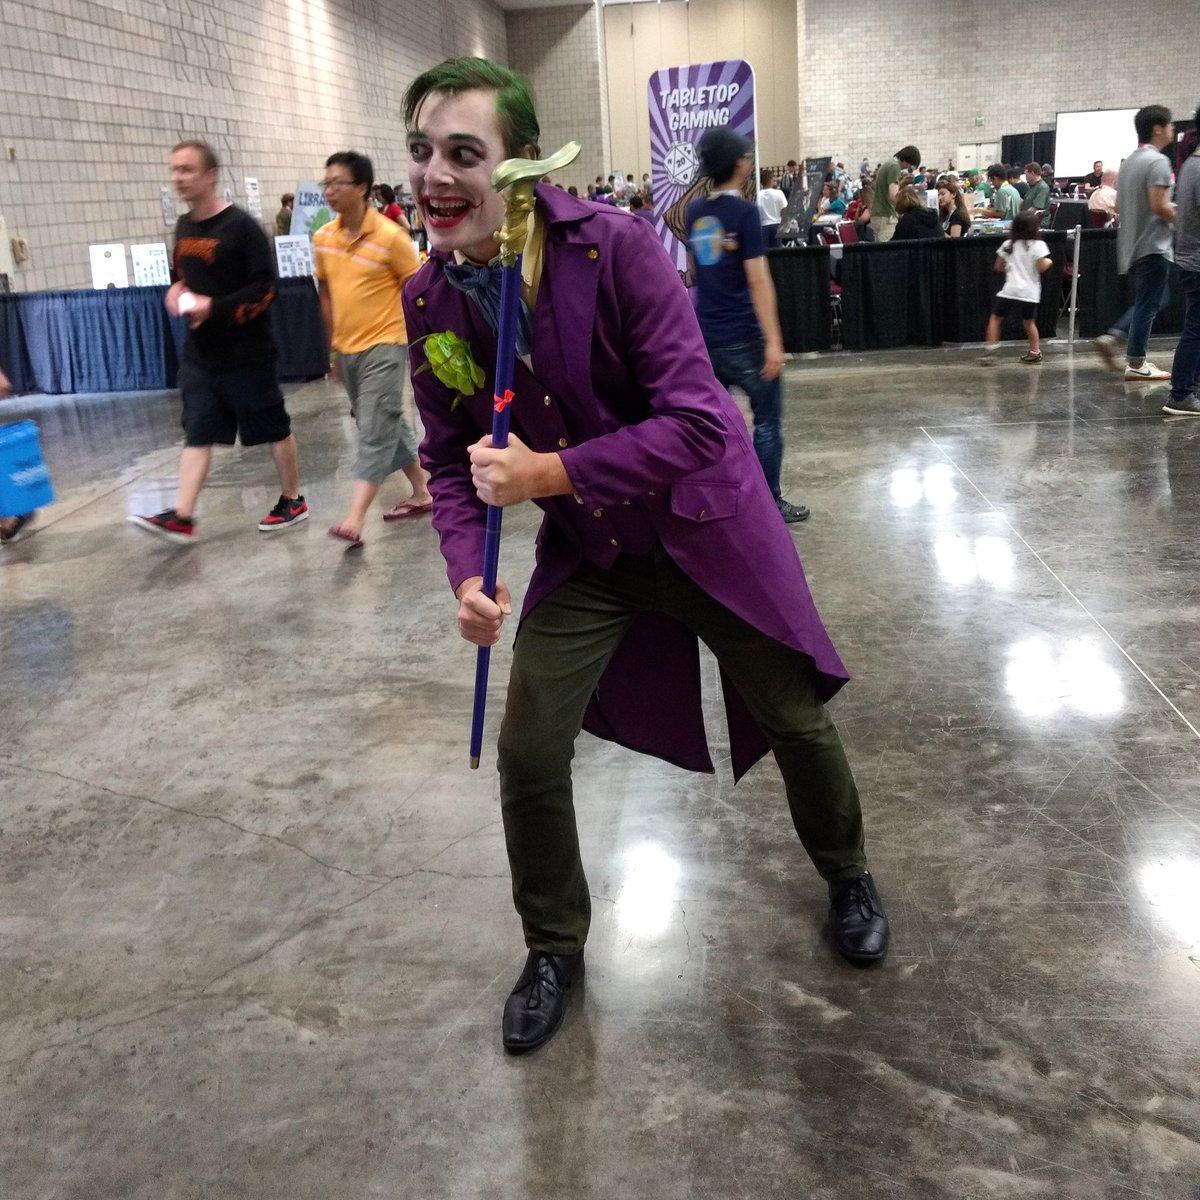 A great Joker #joker #dccomics #cosplay #comicconhonolulu2019 https://t.co/jjY99cMnQd